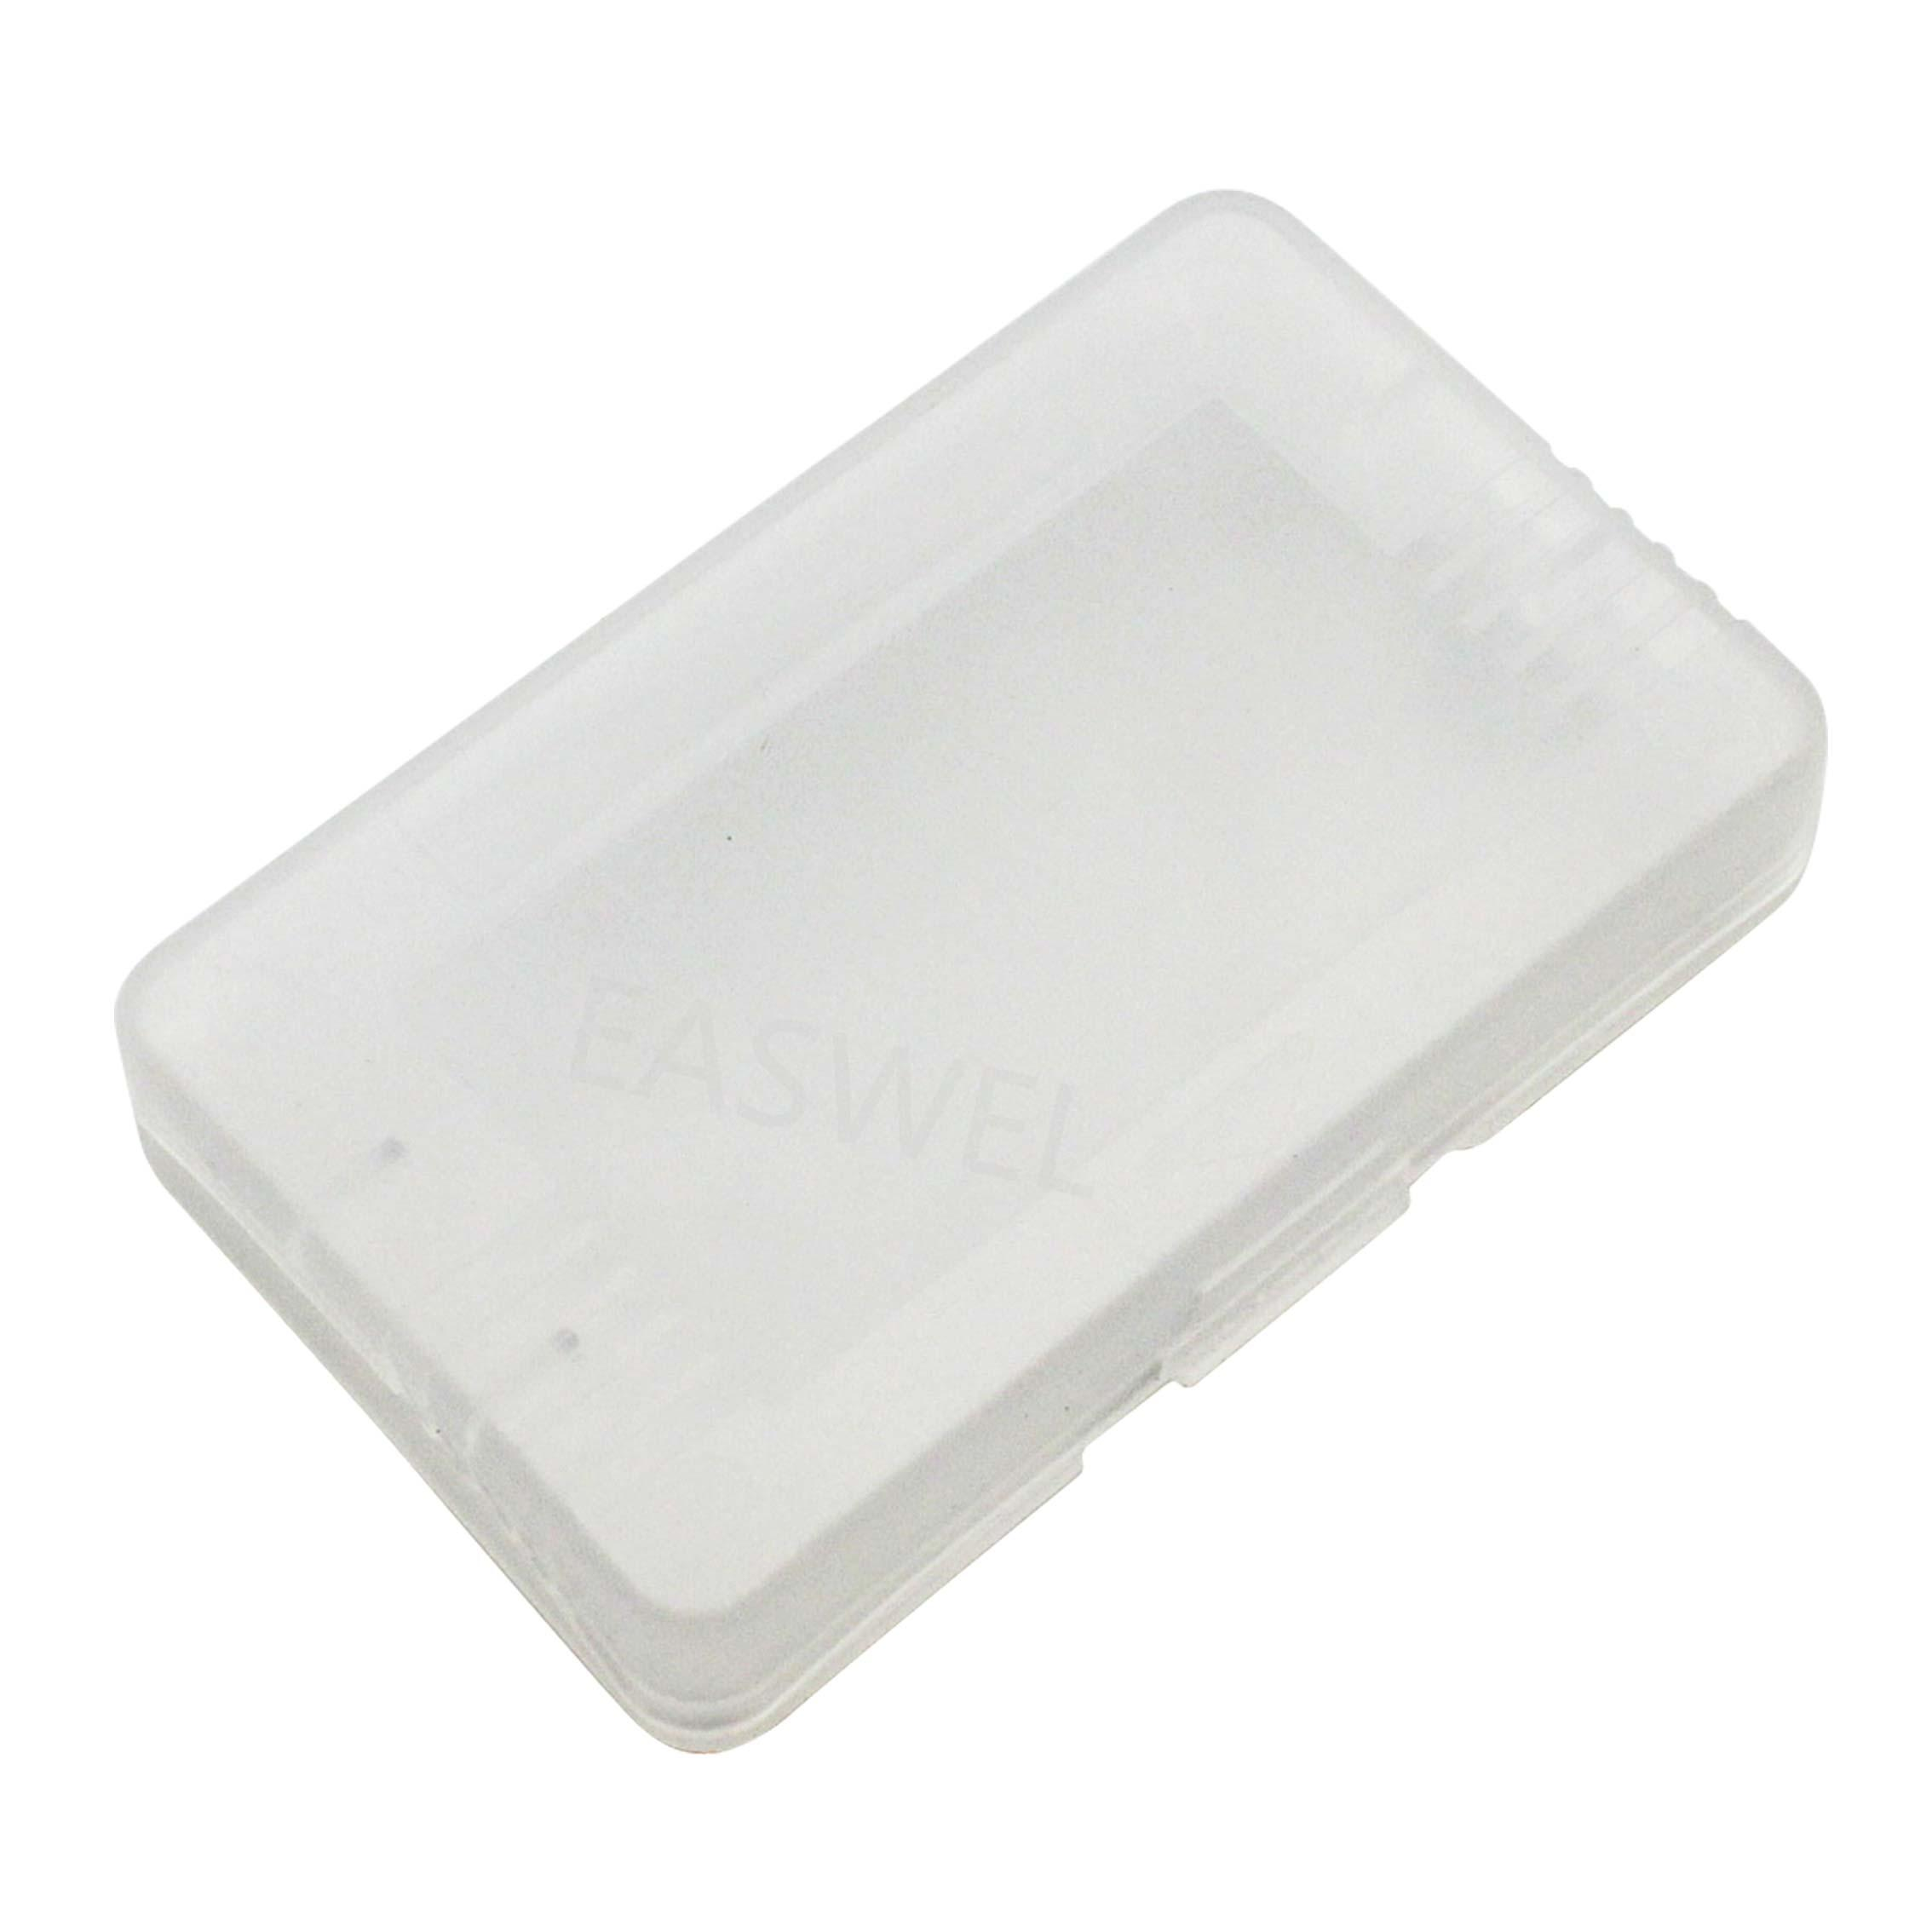 Estuche rígido de plástico transparente para Nintendo Game Boy Advance GBA SP GBM Cartucho de tarjeta de juegos GBA (caja)